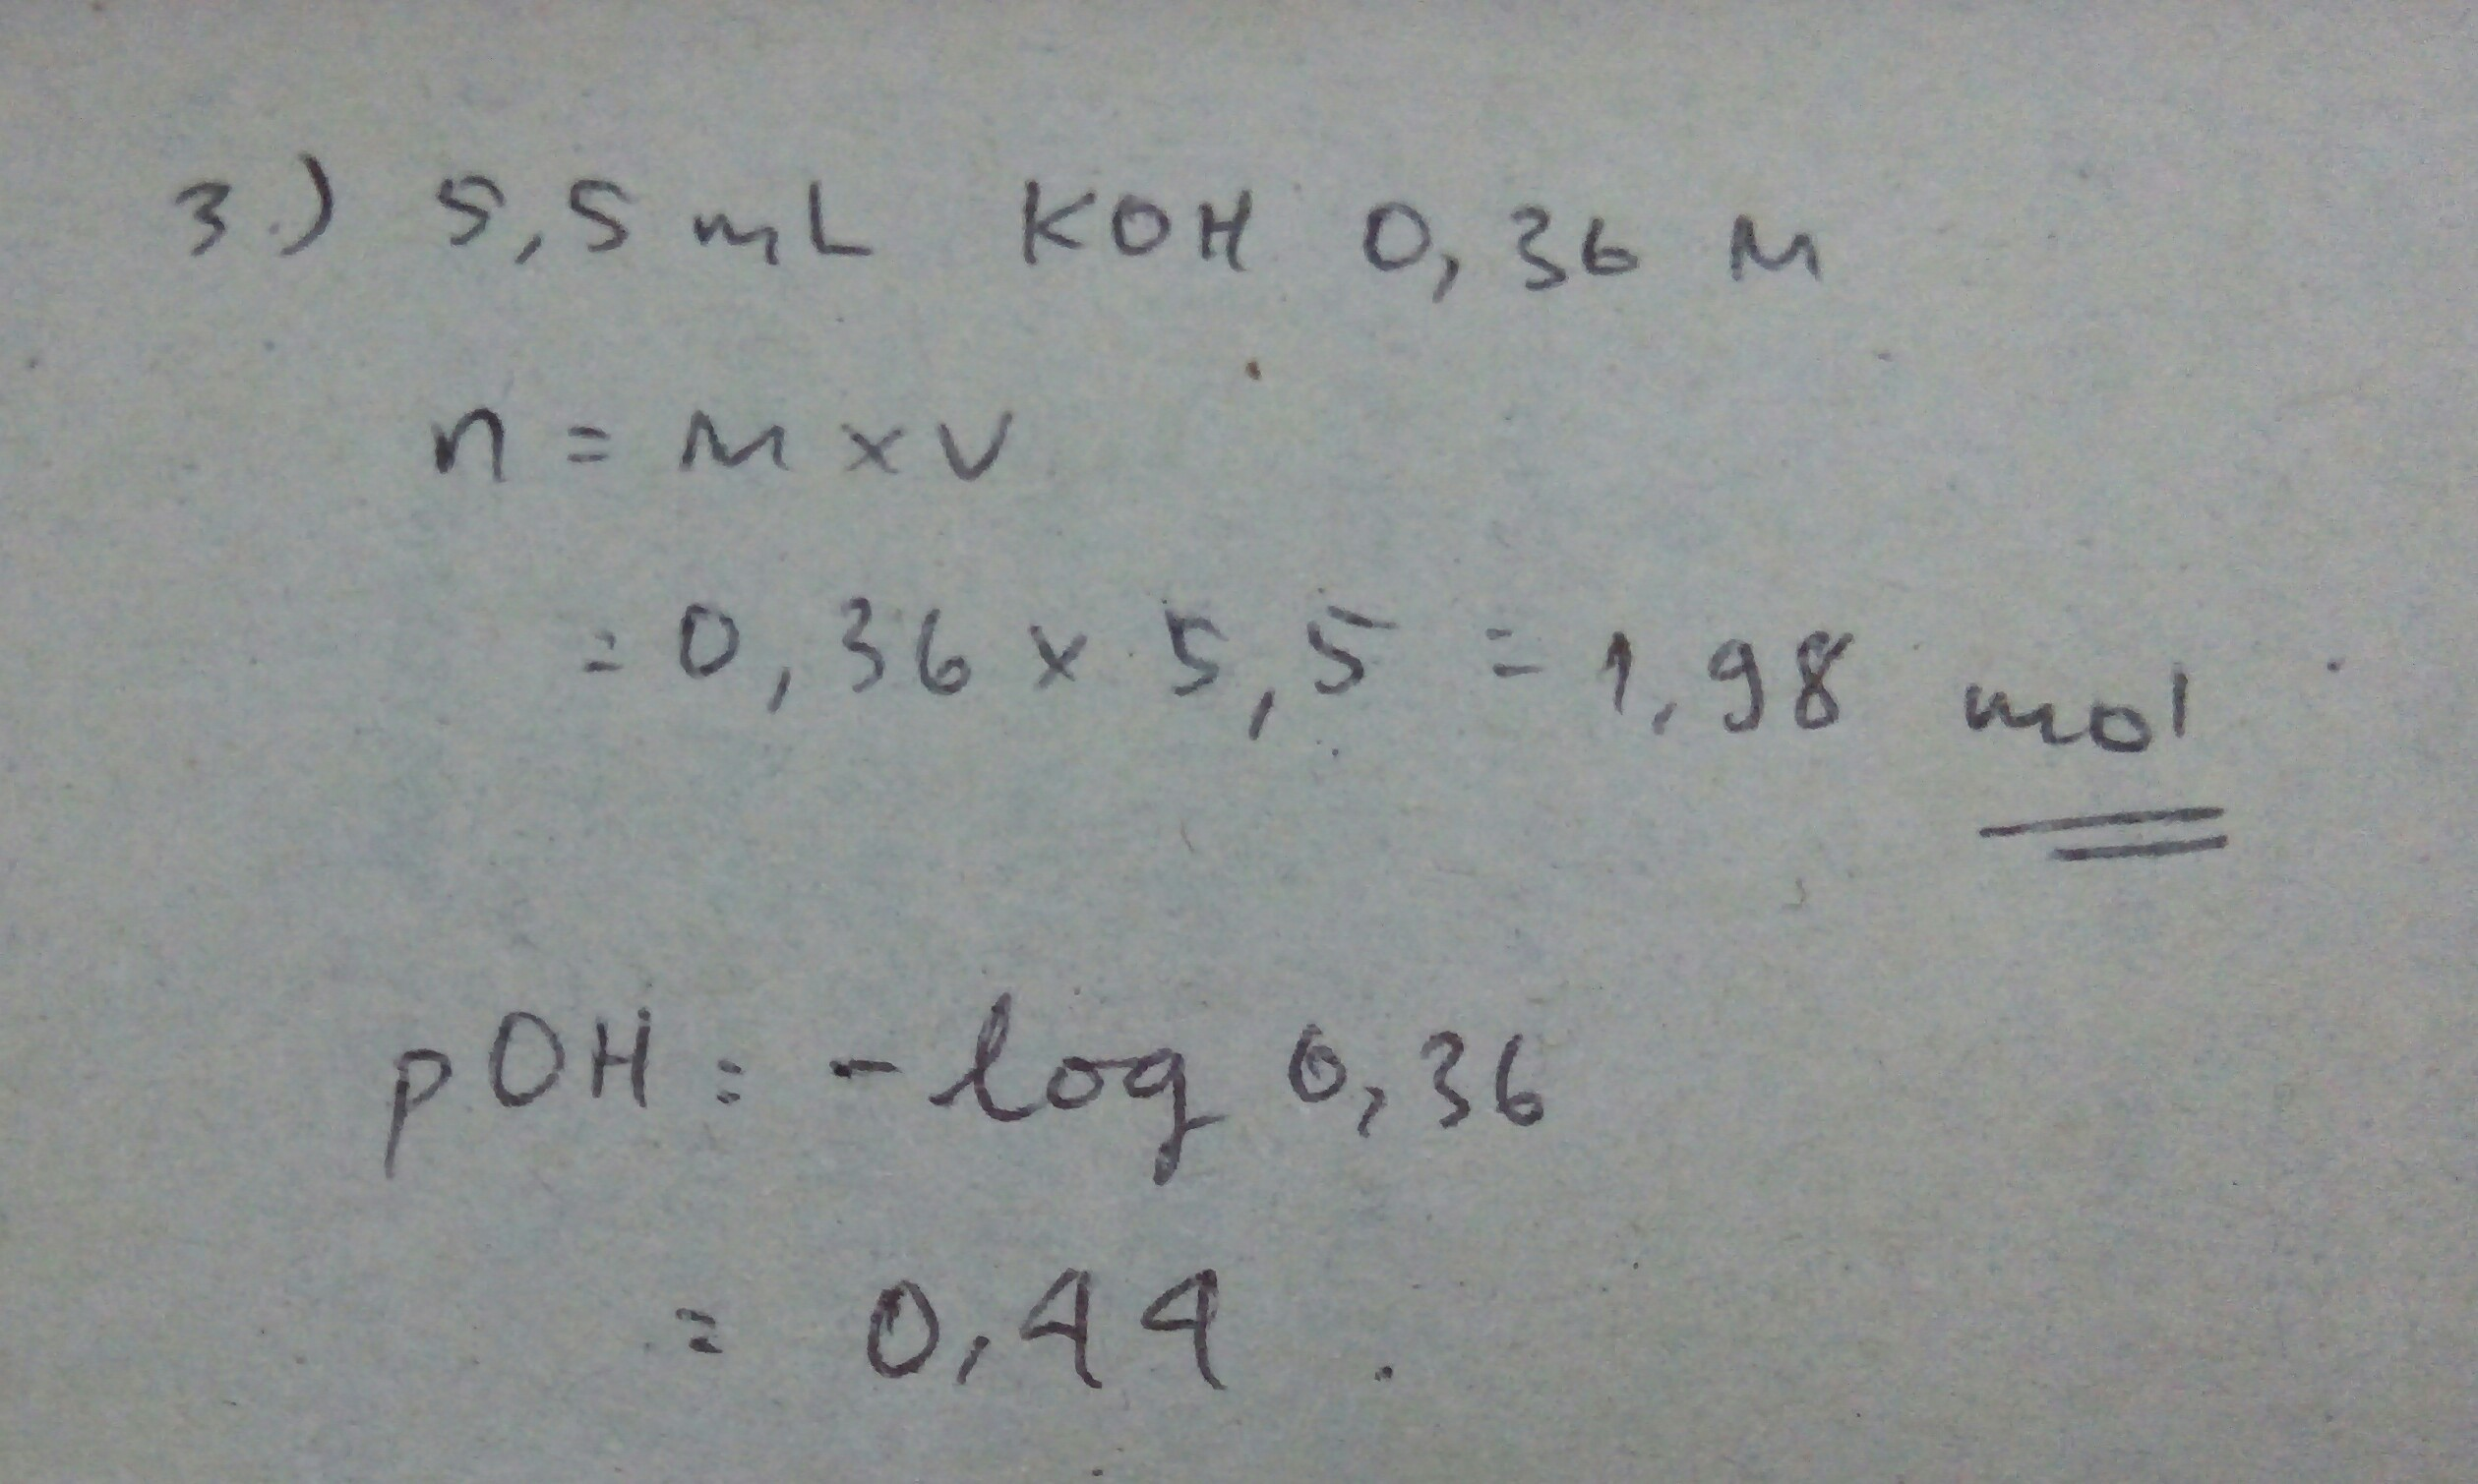 Hitunglah jumlah mol KOH dalam 5,50 mol larutan koh 0, 360 ...